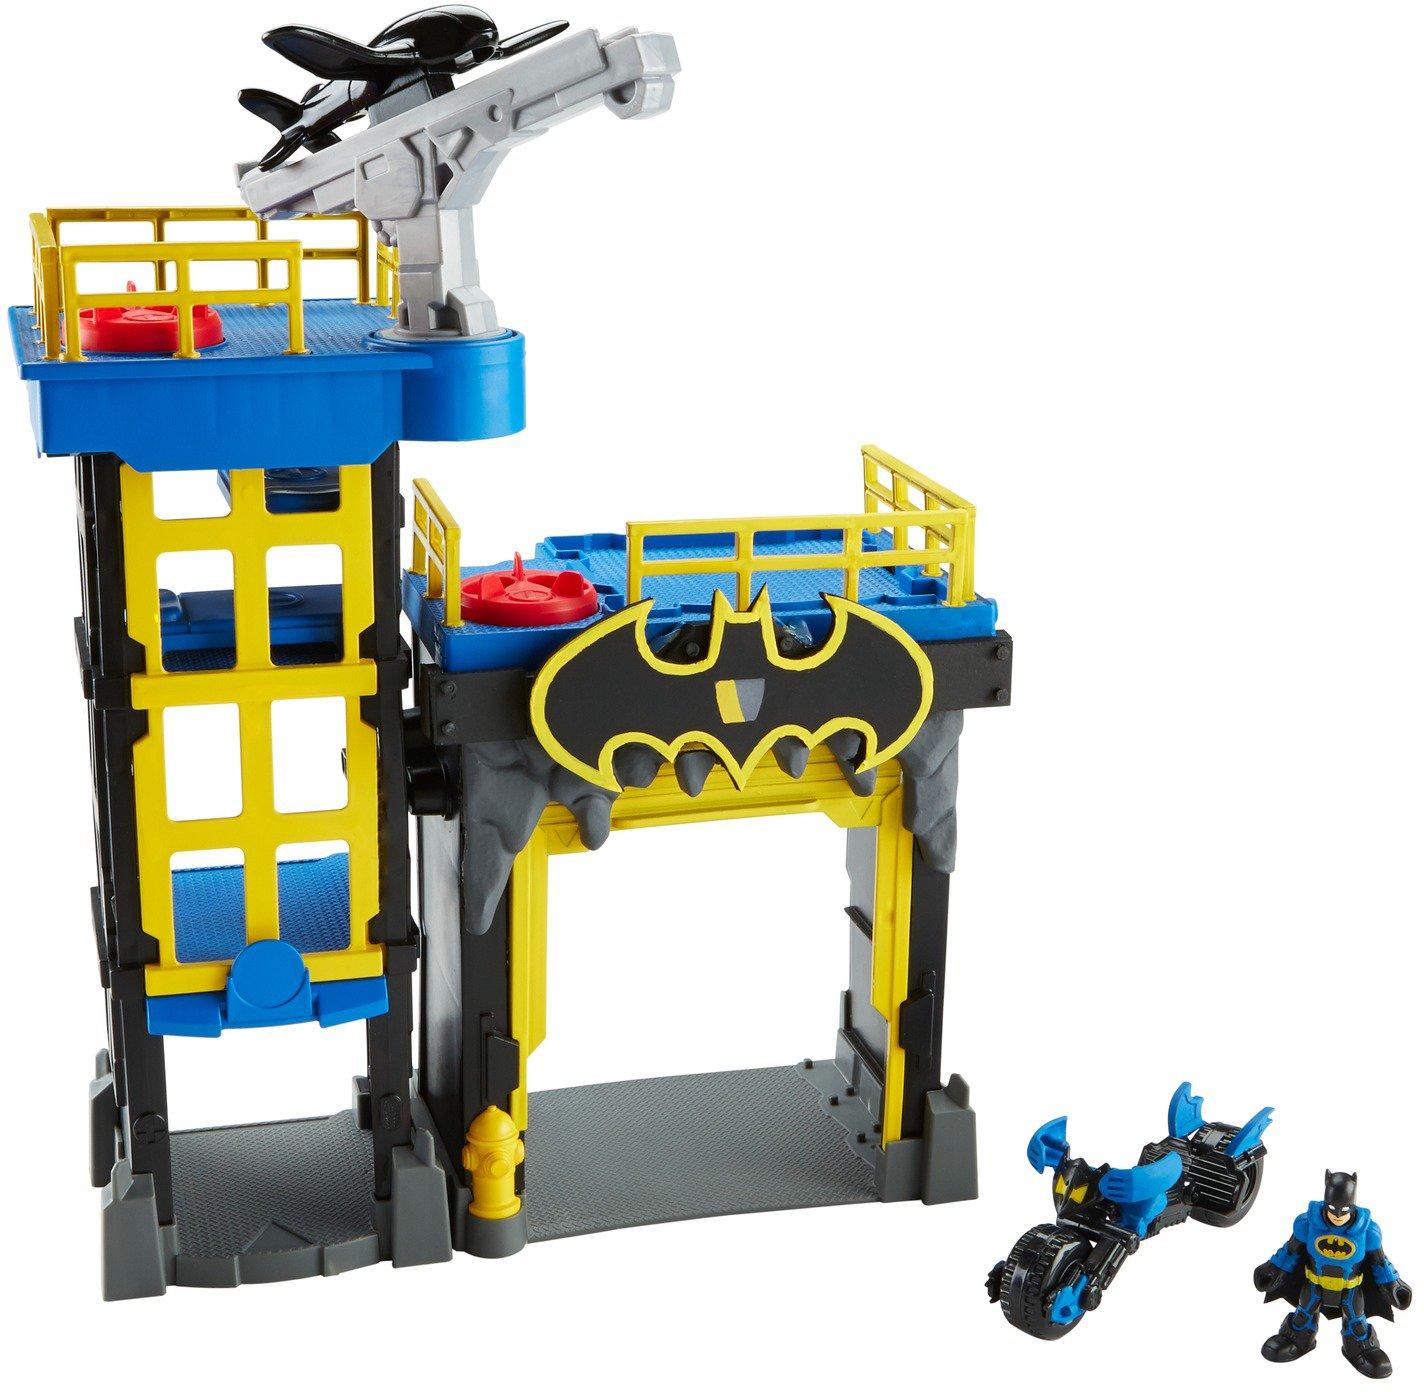 Fisher Price DC Super Friends Batman Imaginext Gotham City Tower Playset by DC Comics